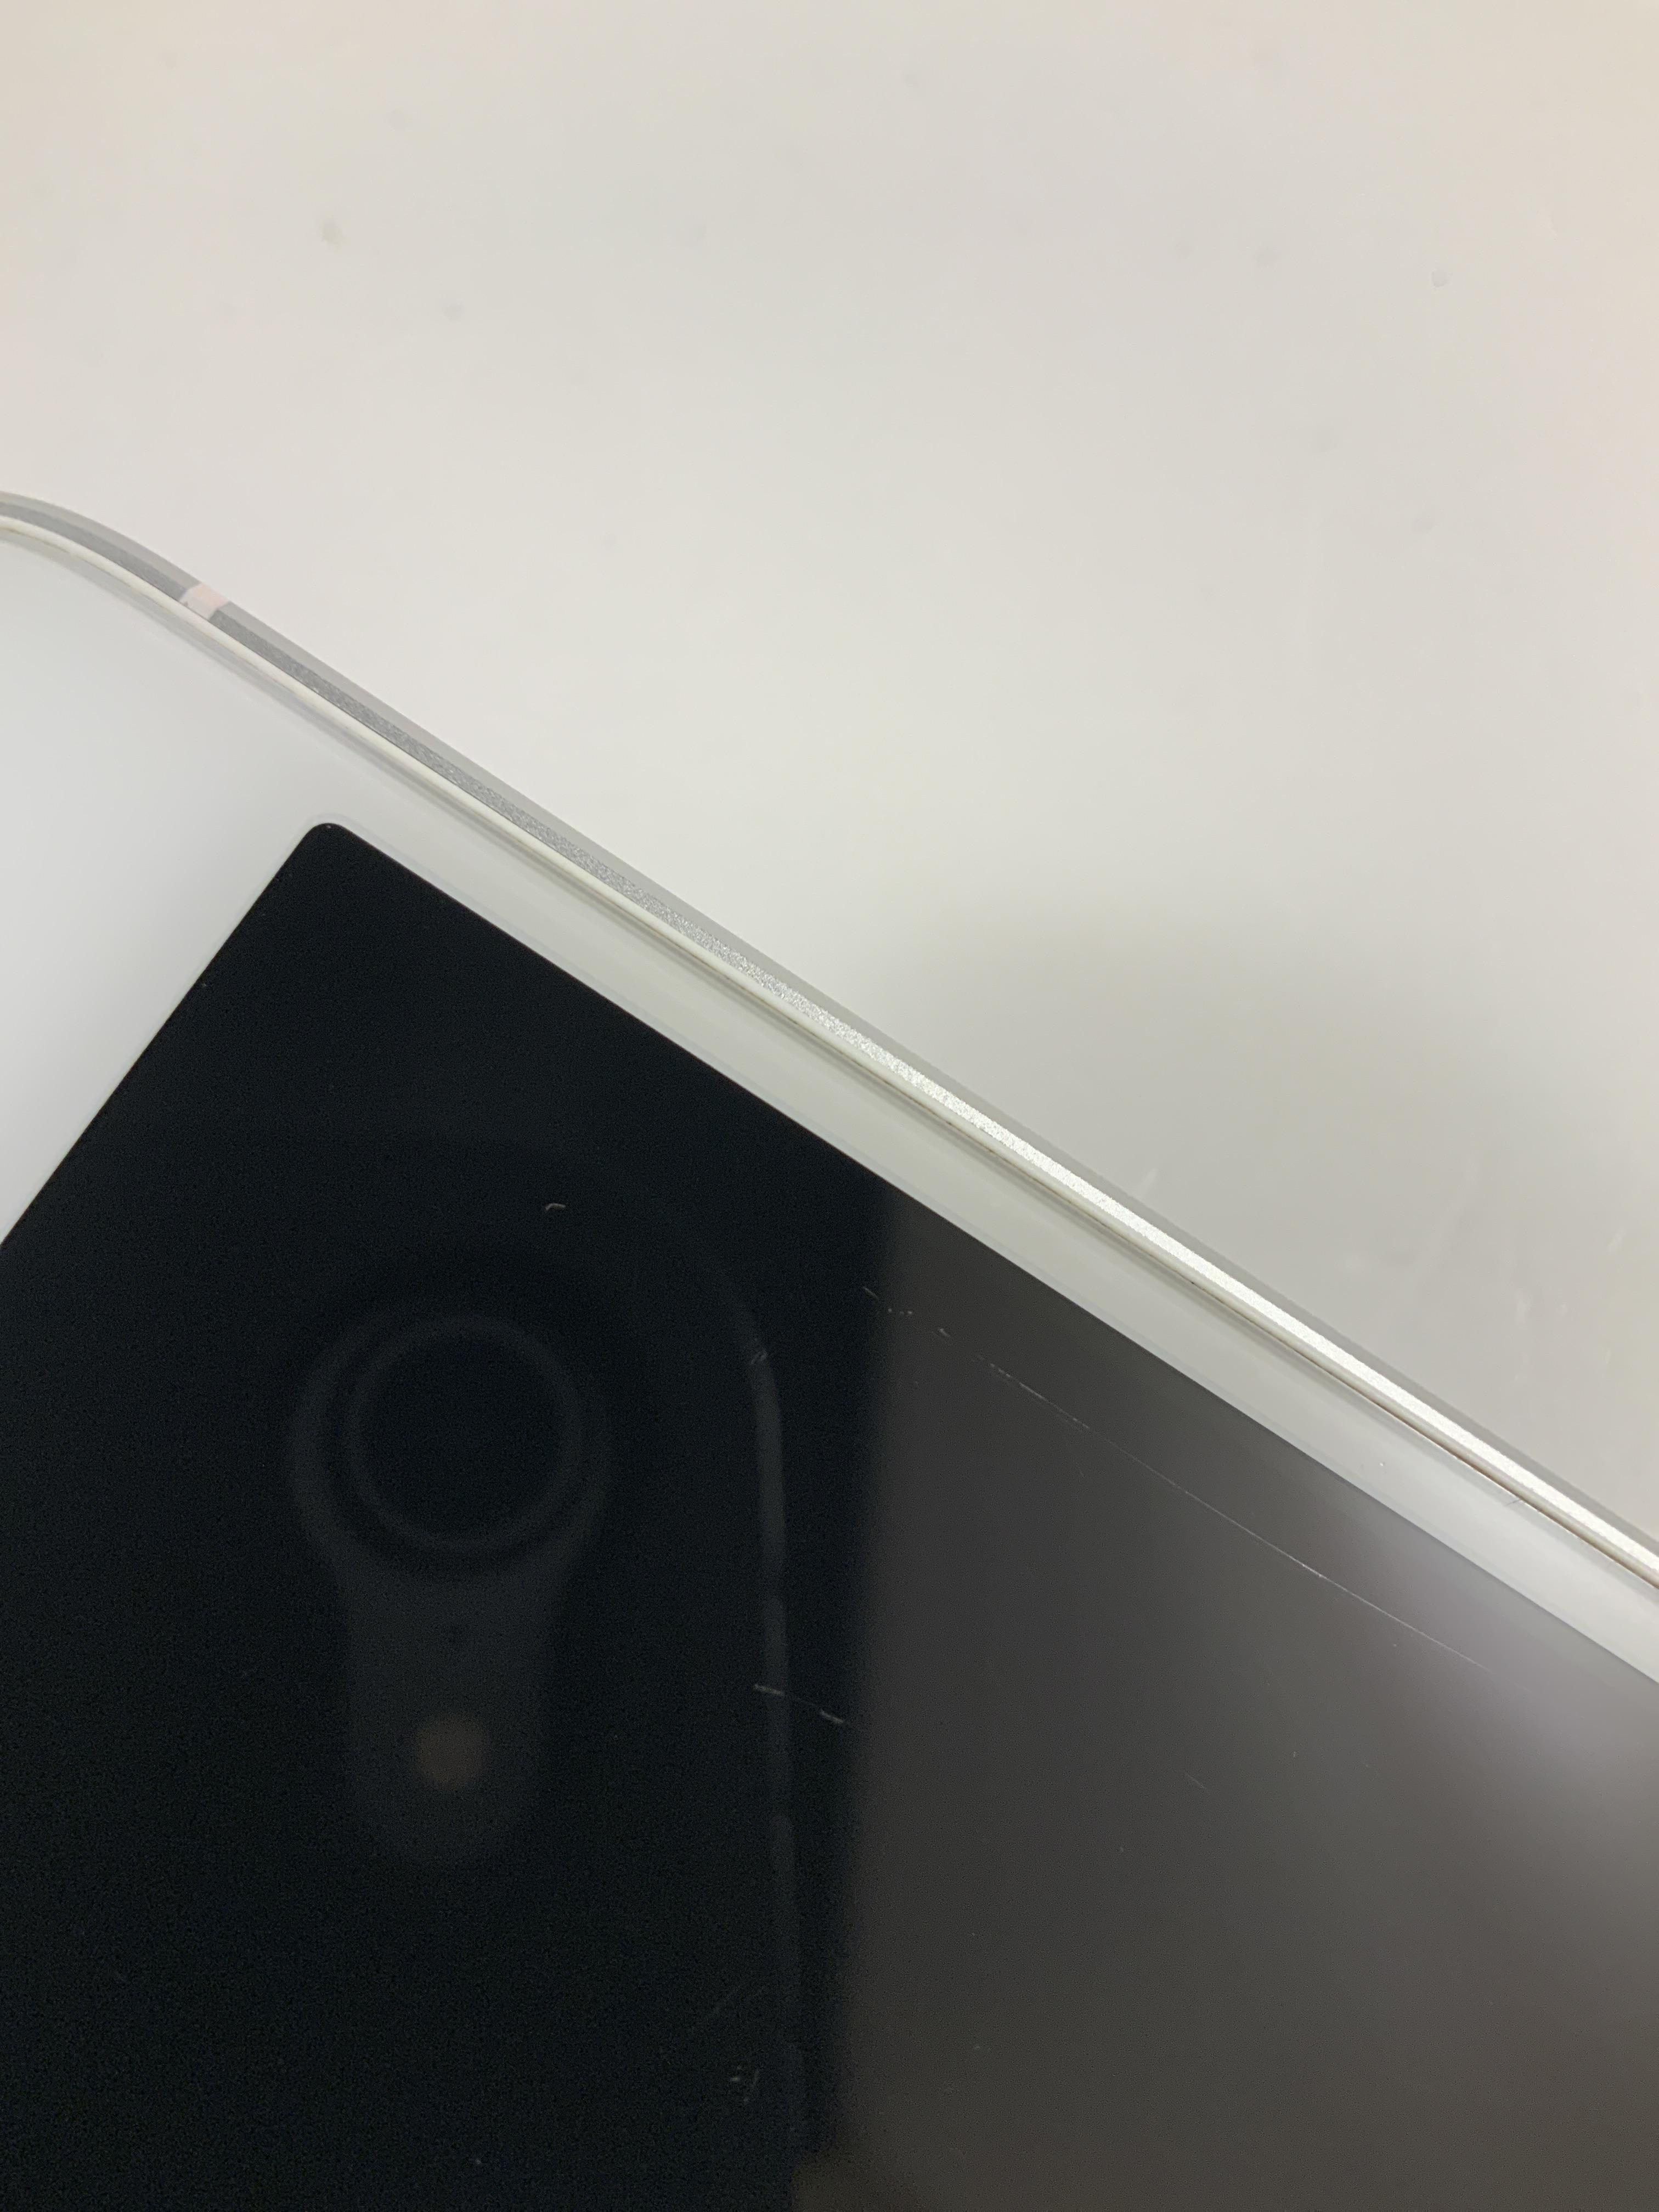 iPhone SE 32GB, 32GB, Silver, bild 4